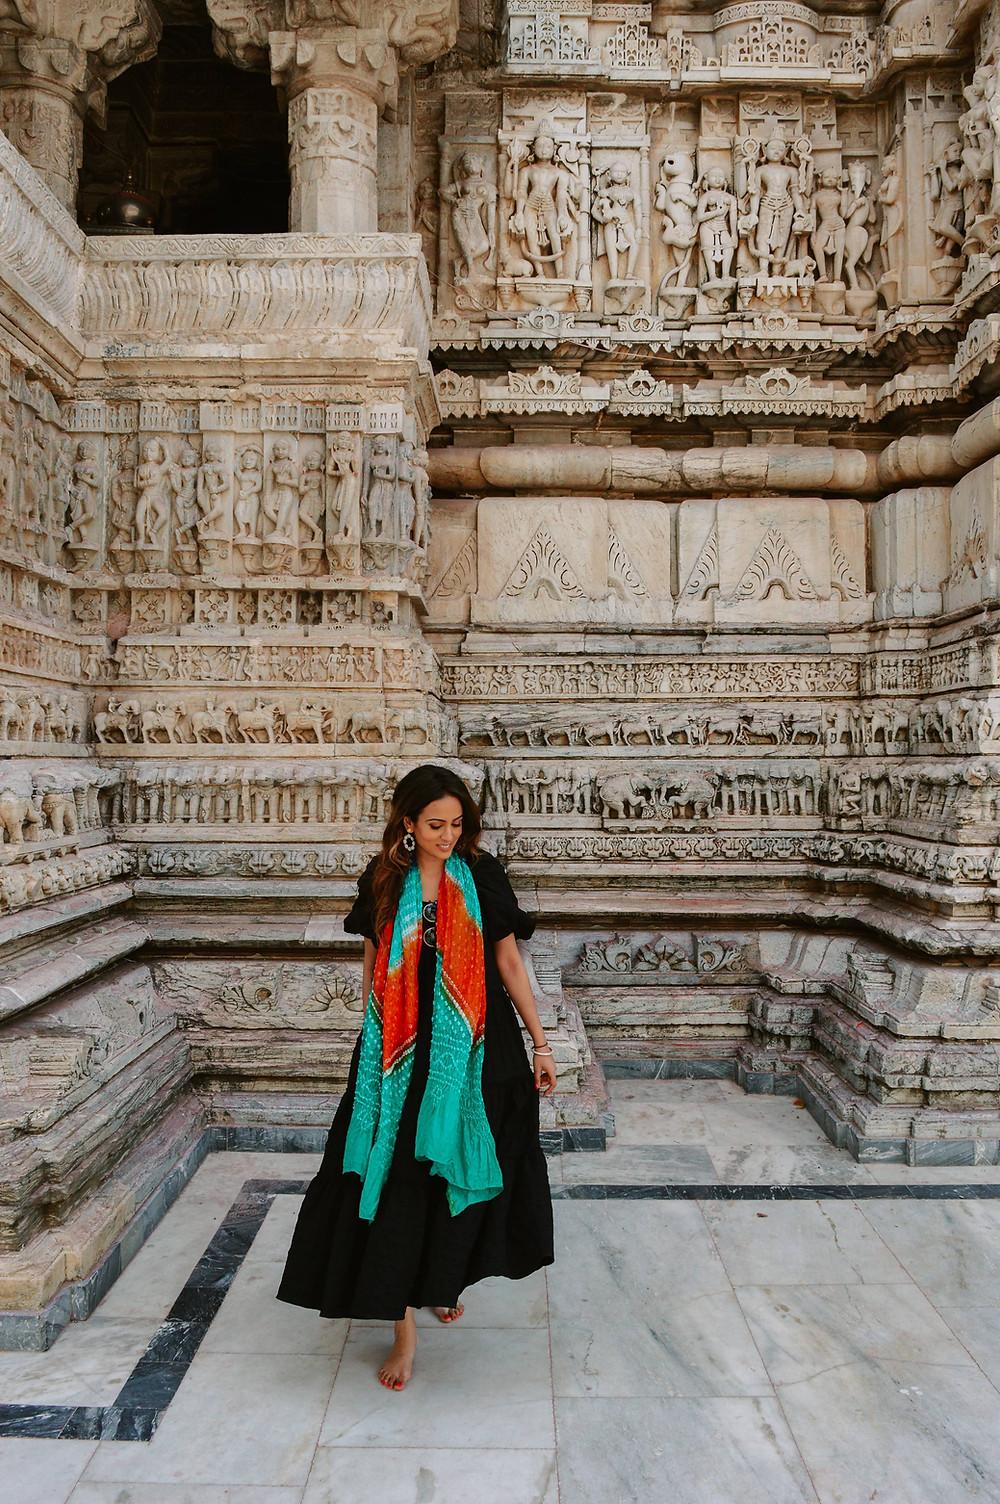 jagdish temple udaipur details